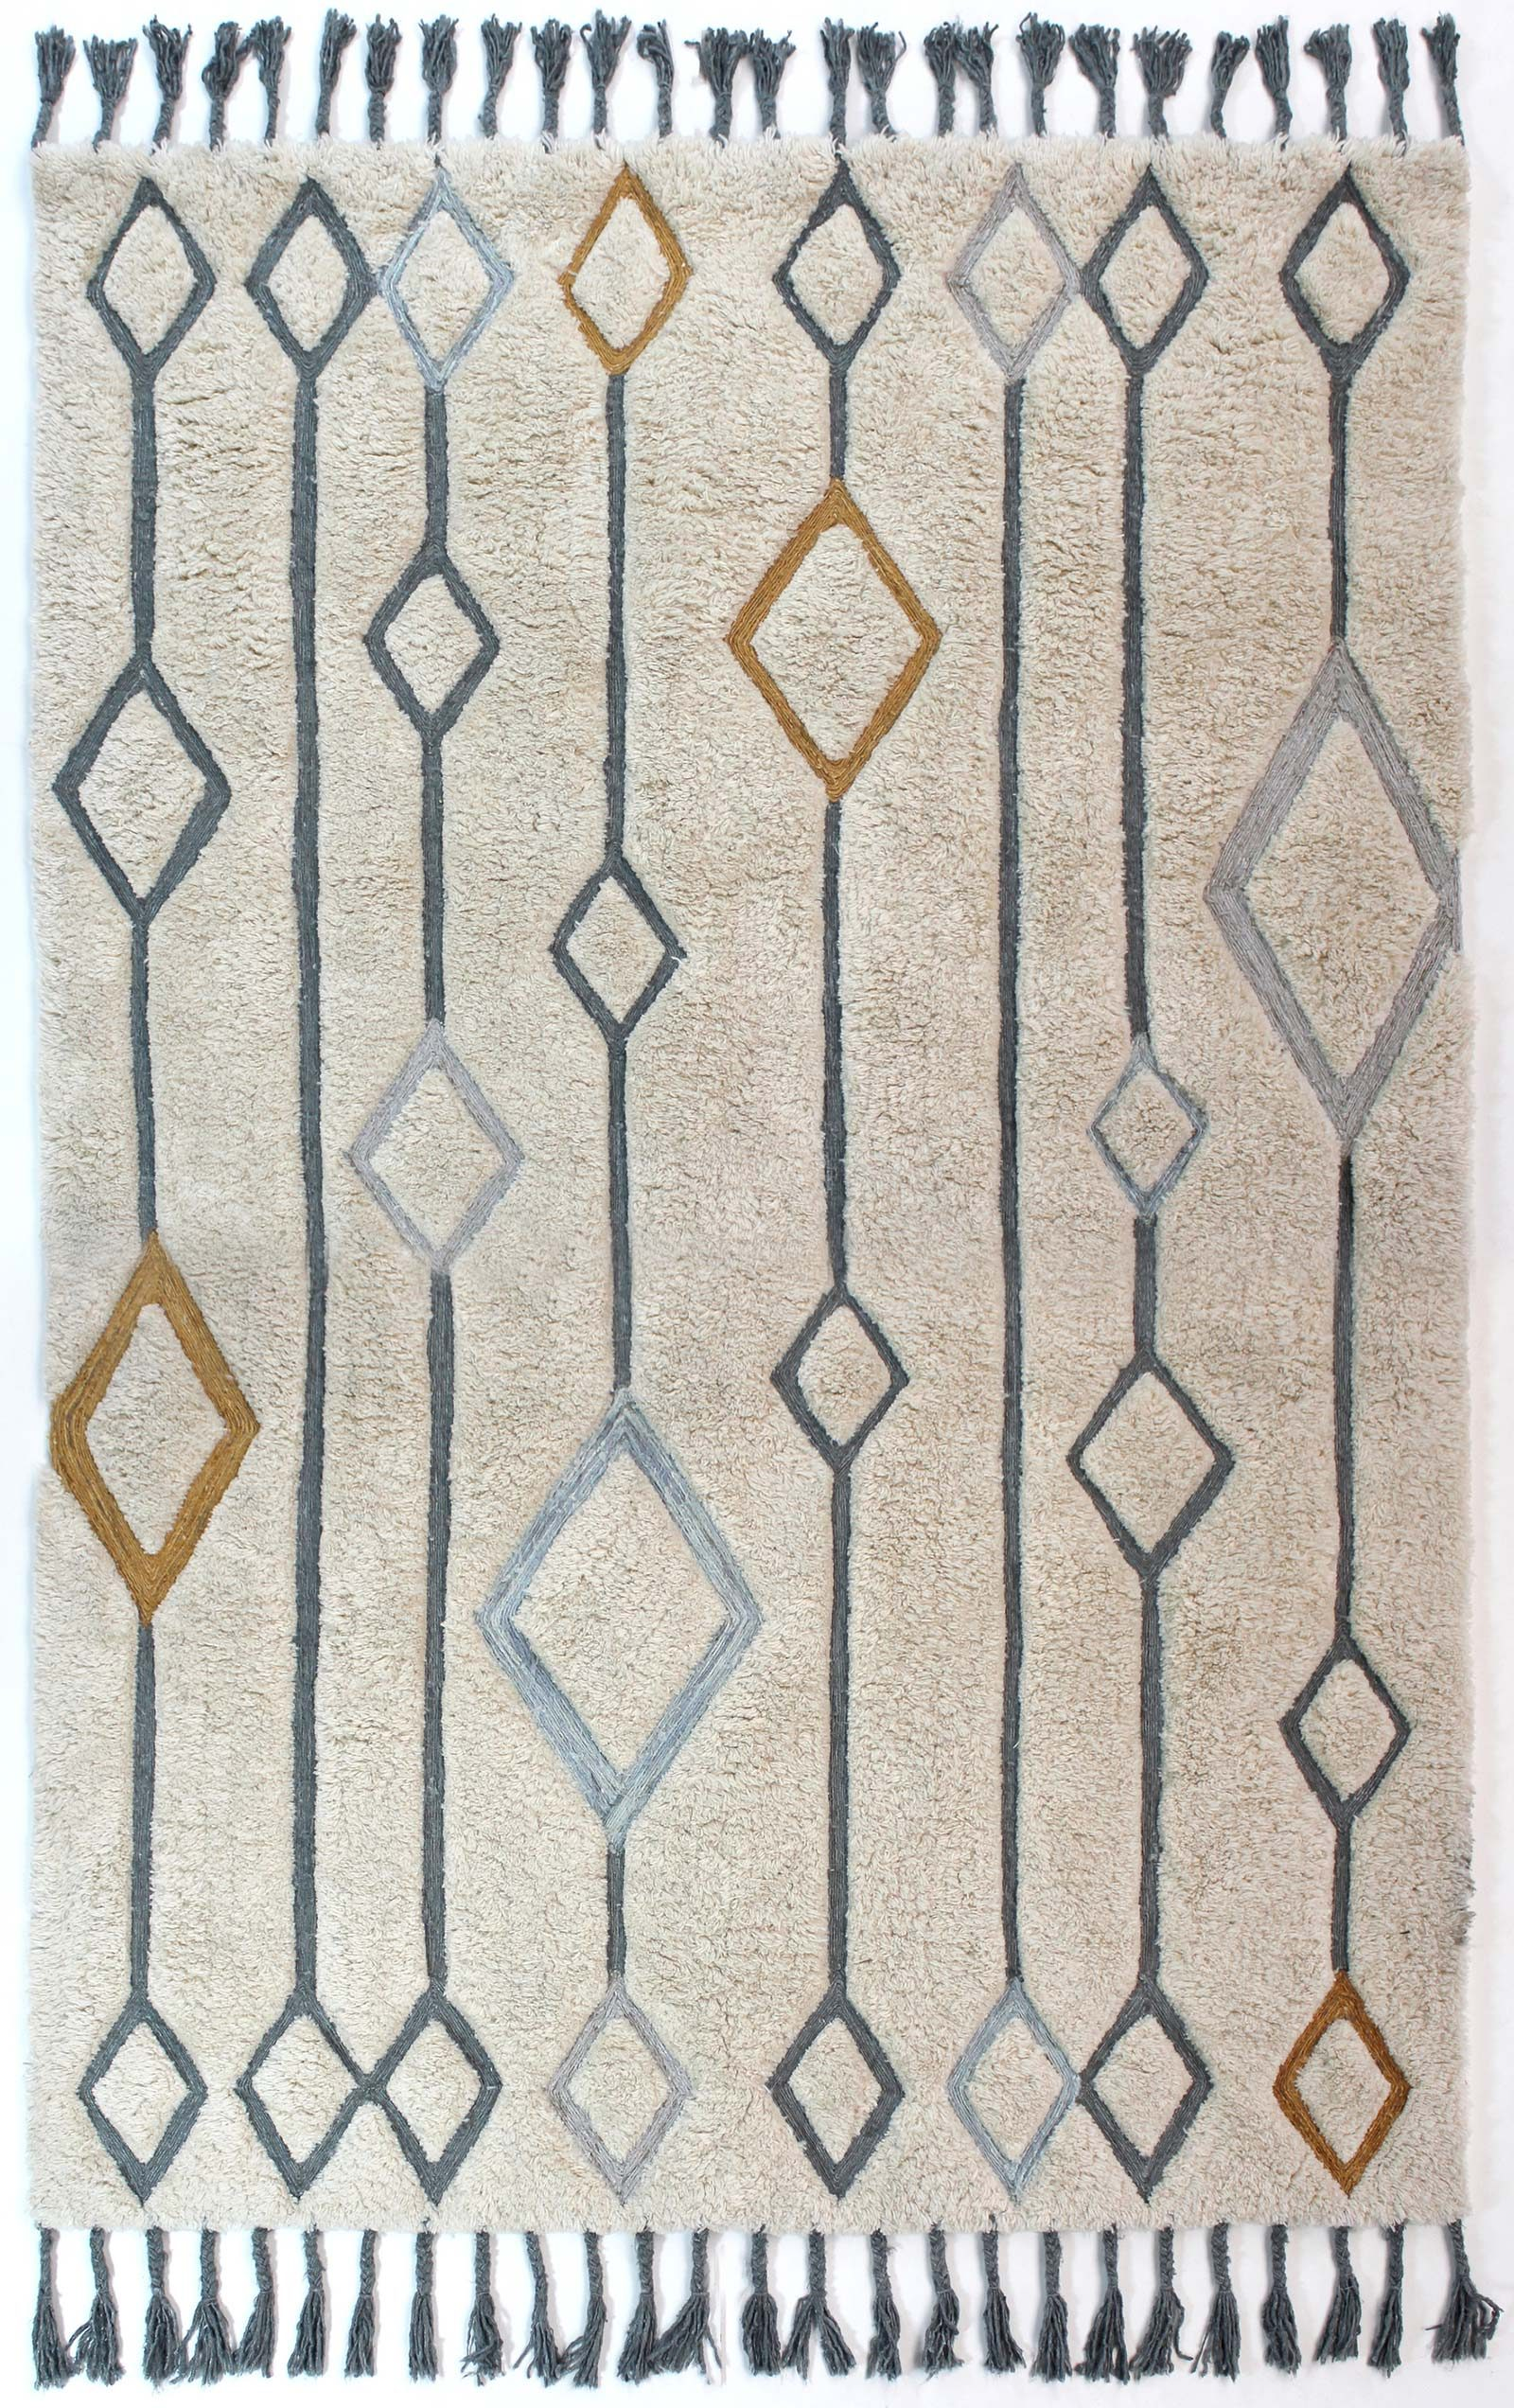 tapijt Luxmi Solitaire Beau Ochre